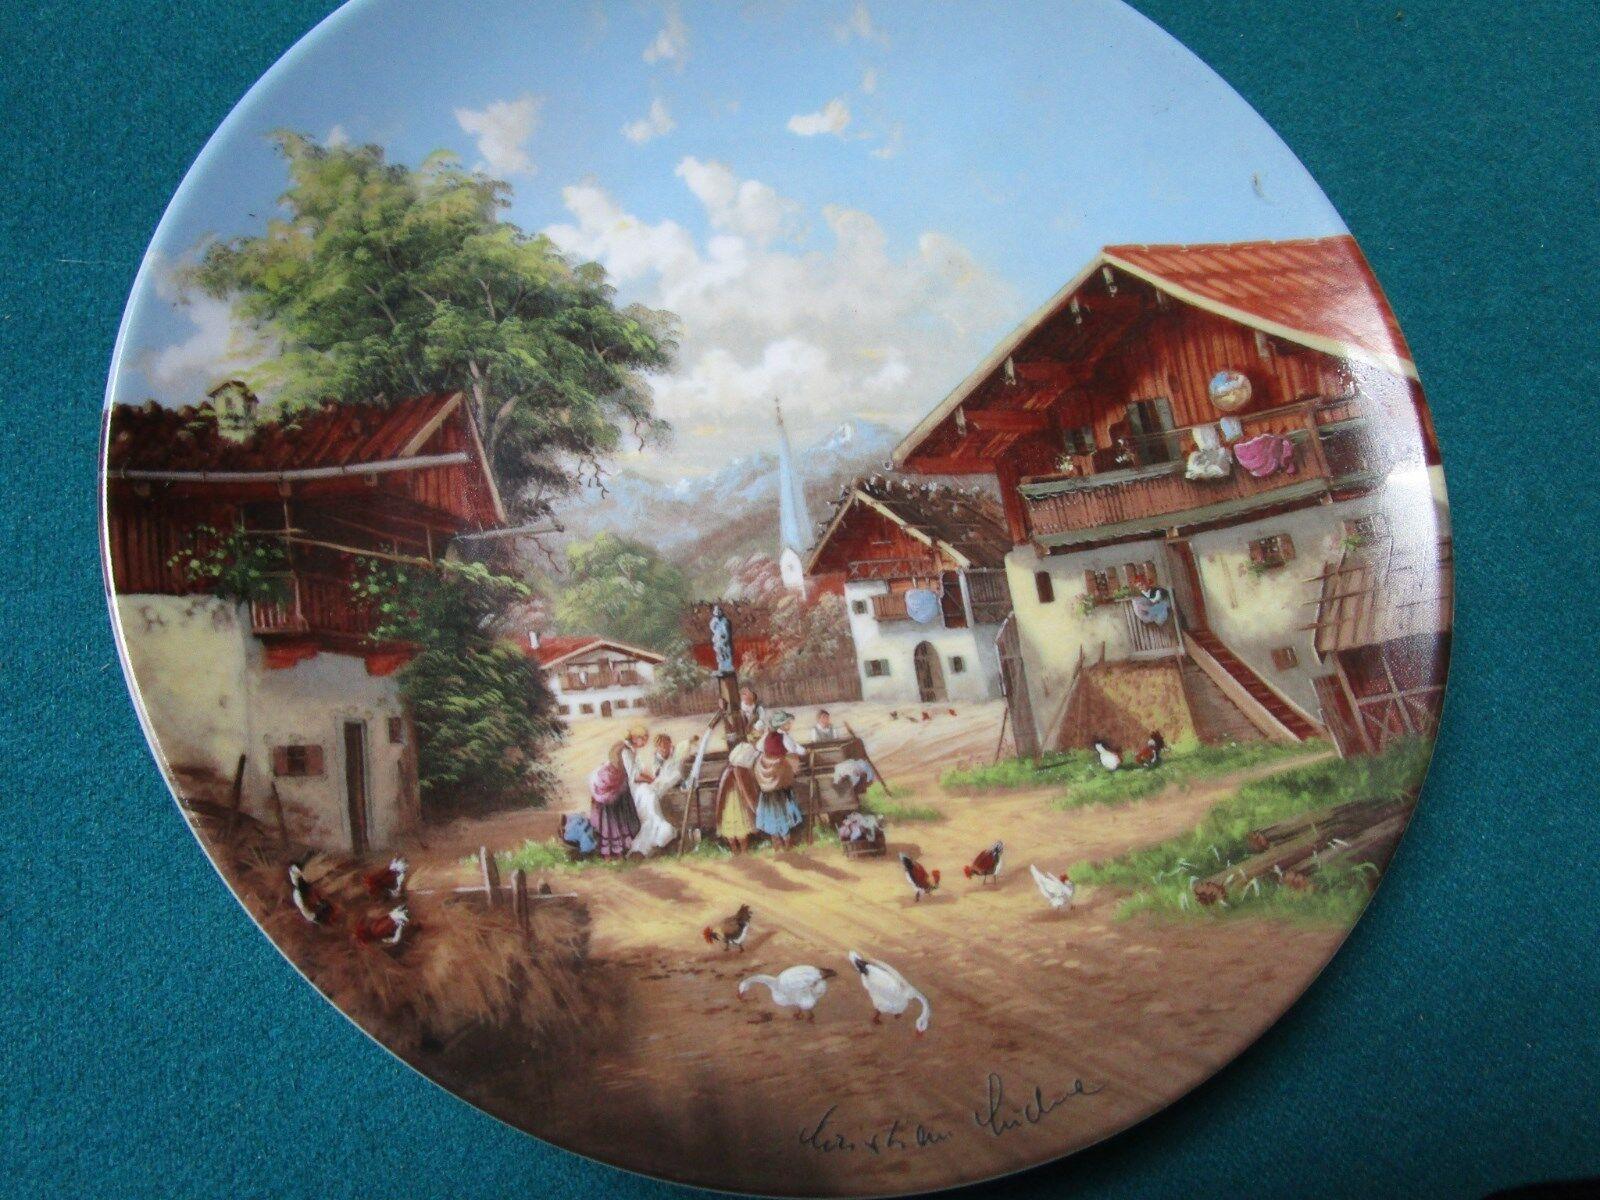 seltmann weiden 8 collector plates christian luckel 39 s idyllic village life 6 ebay. Black Bedroom Furniture Sets. Home Design Ideas